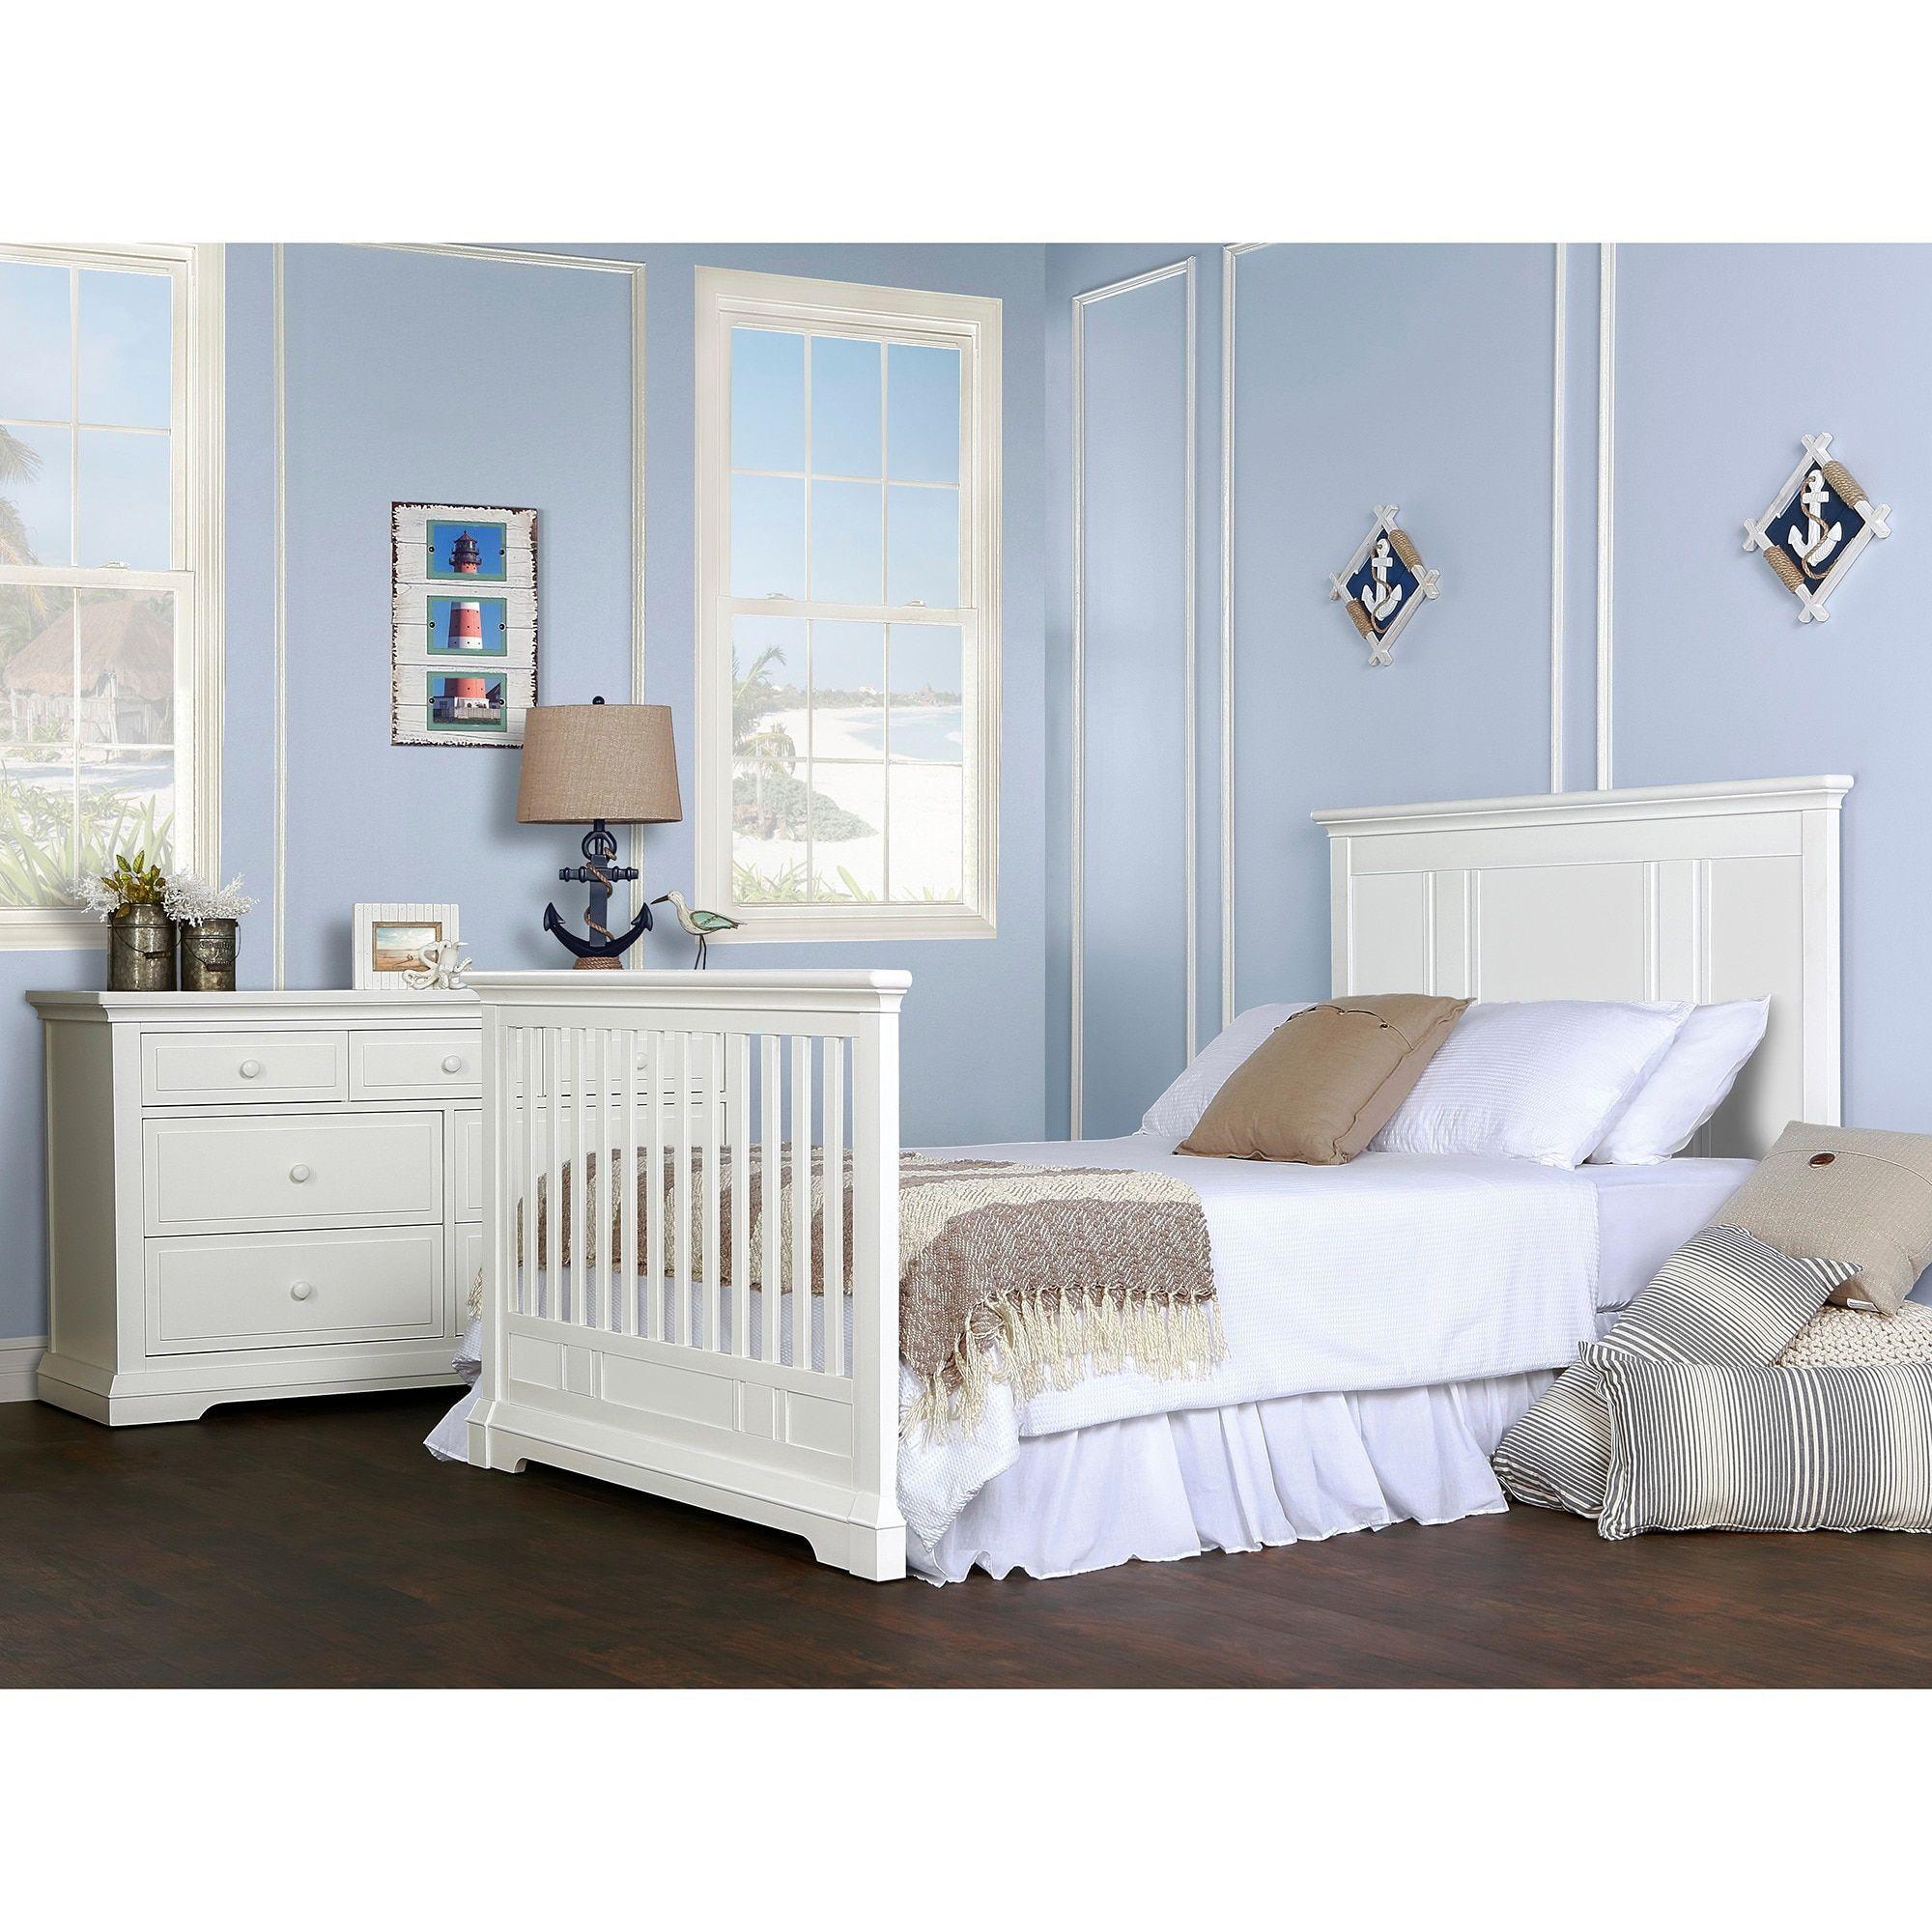 Evolur Convertible Crib en Full Size Bed Rail